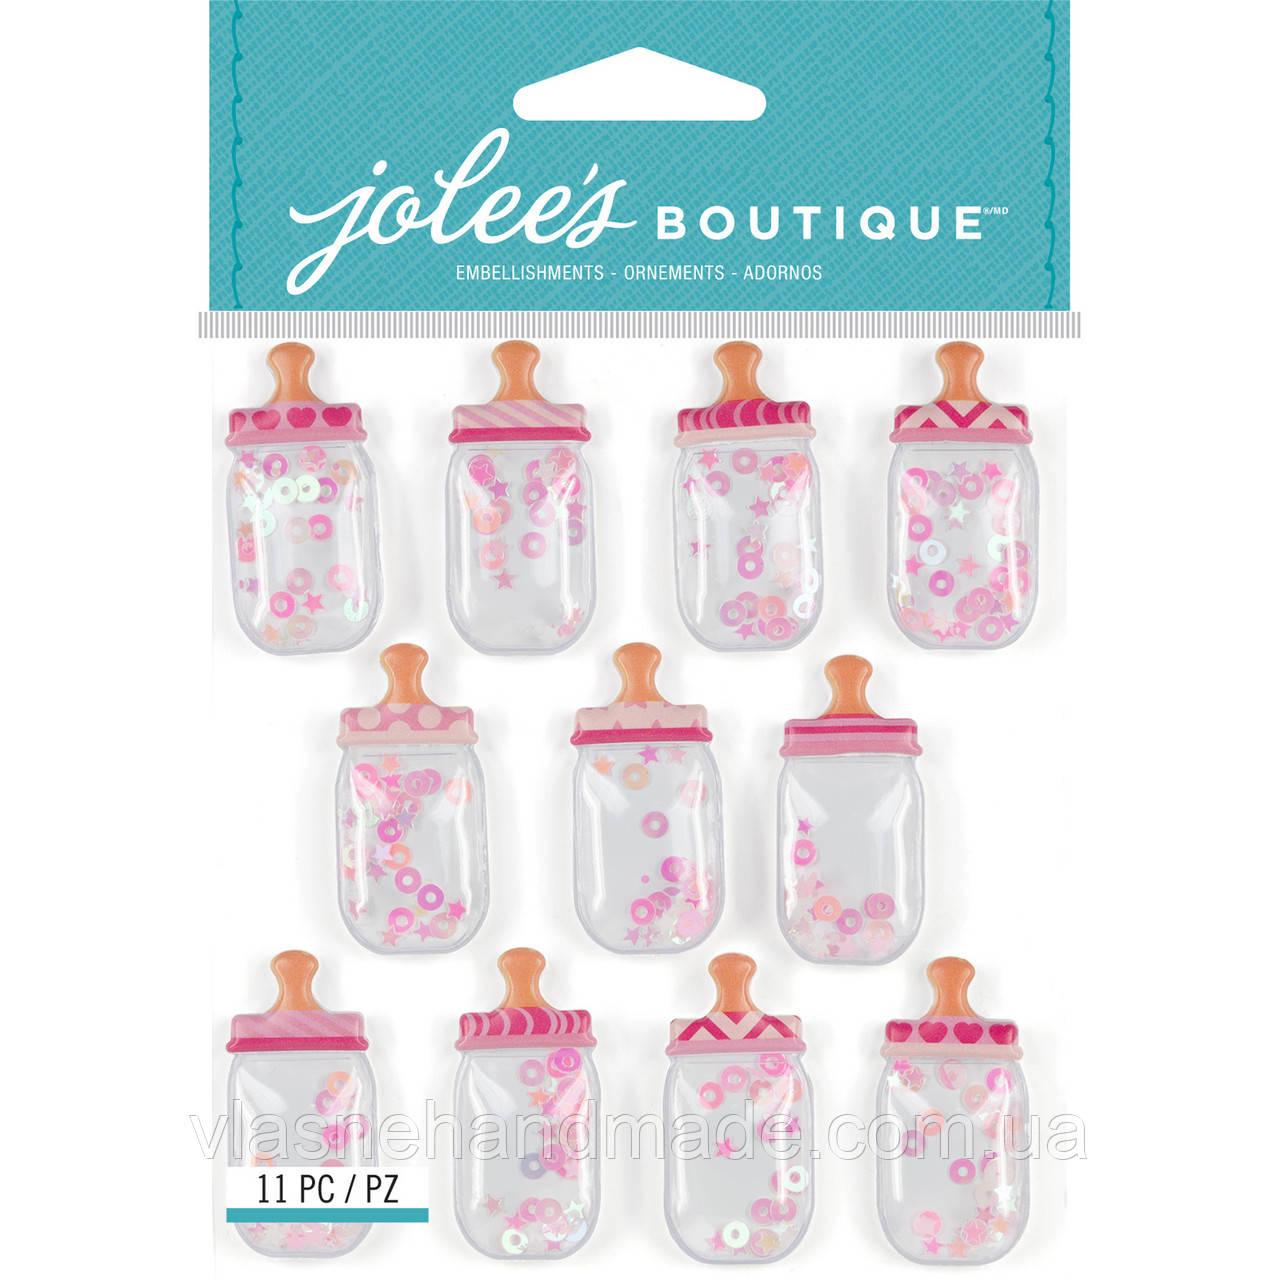 Шейкери - BABY GIRL BOTTLES - Jolee's Boutique - 3.5х1.8 см Ціна за 1 шт.!!!